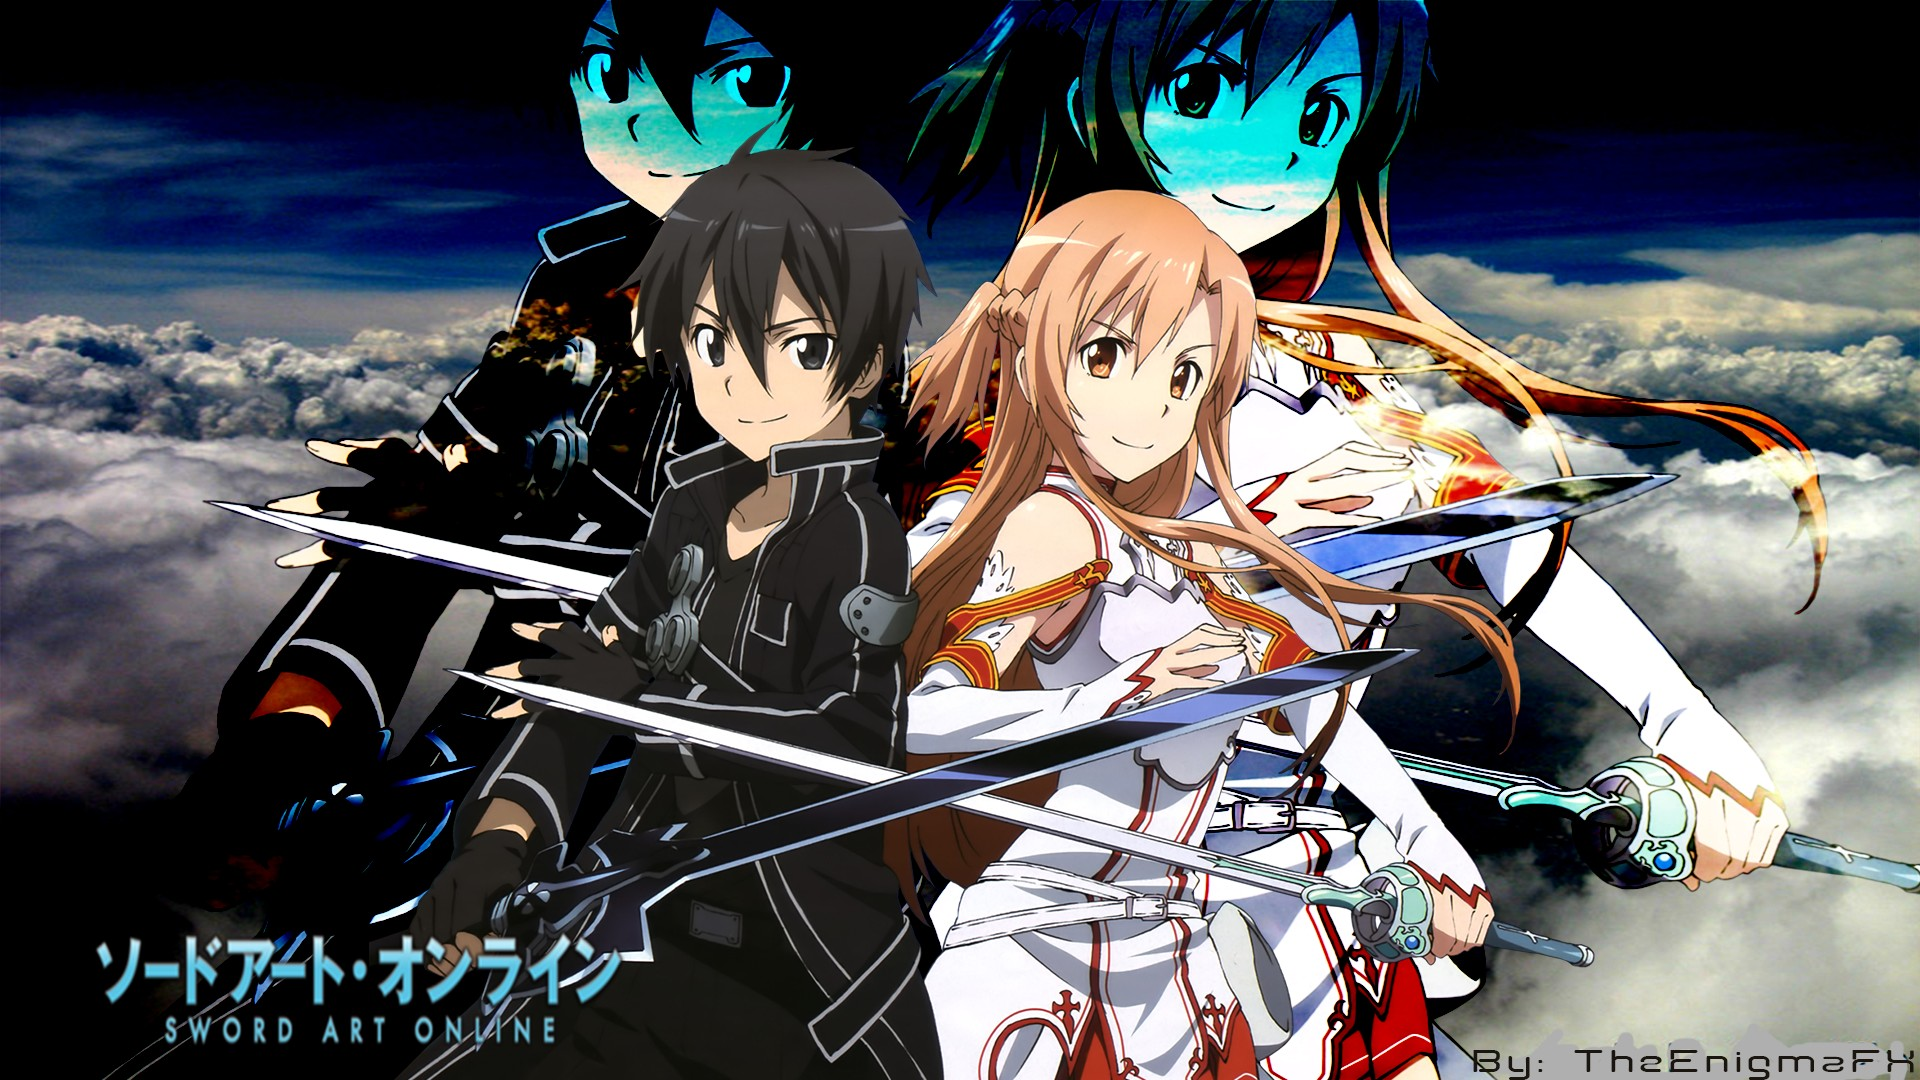 Sword Art Online Background Download Free Beautiful High